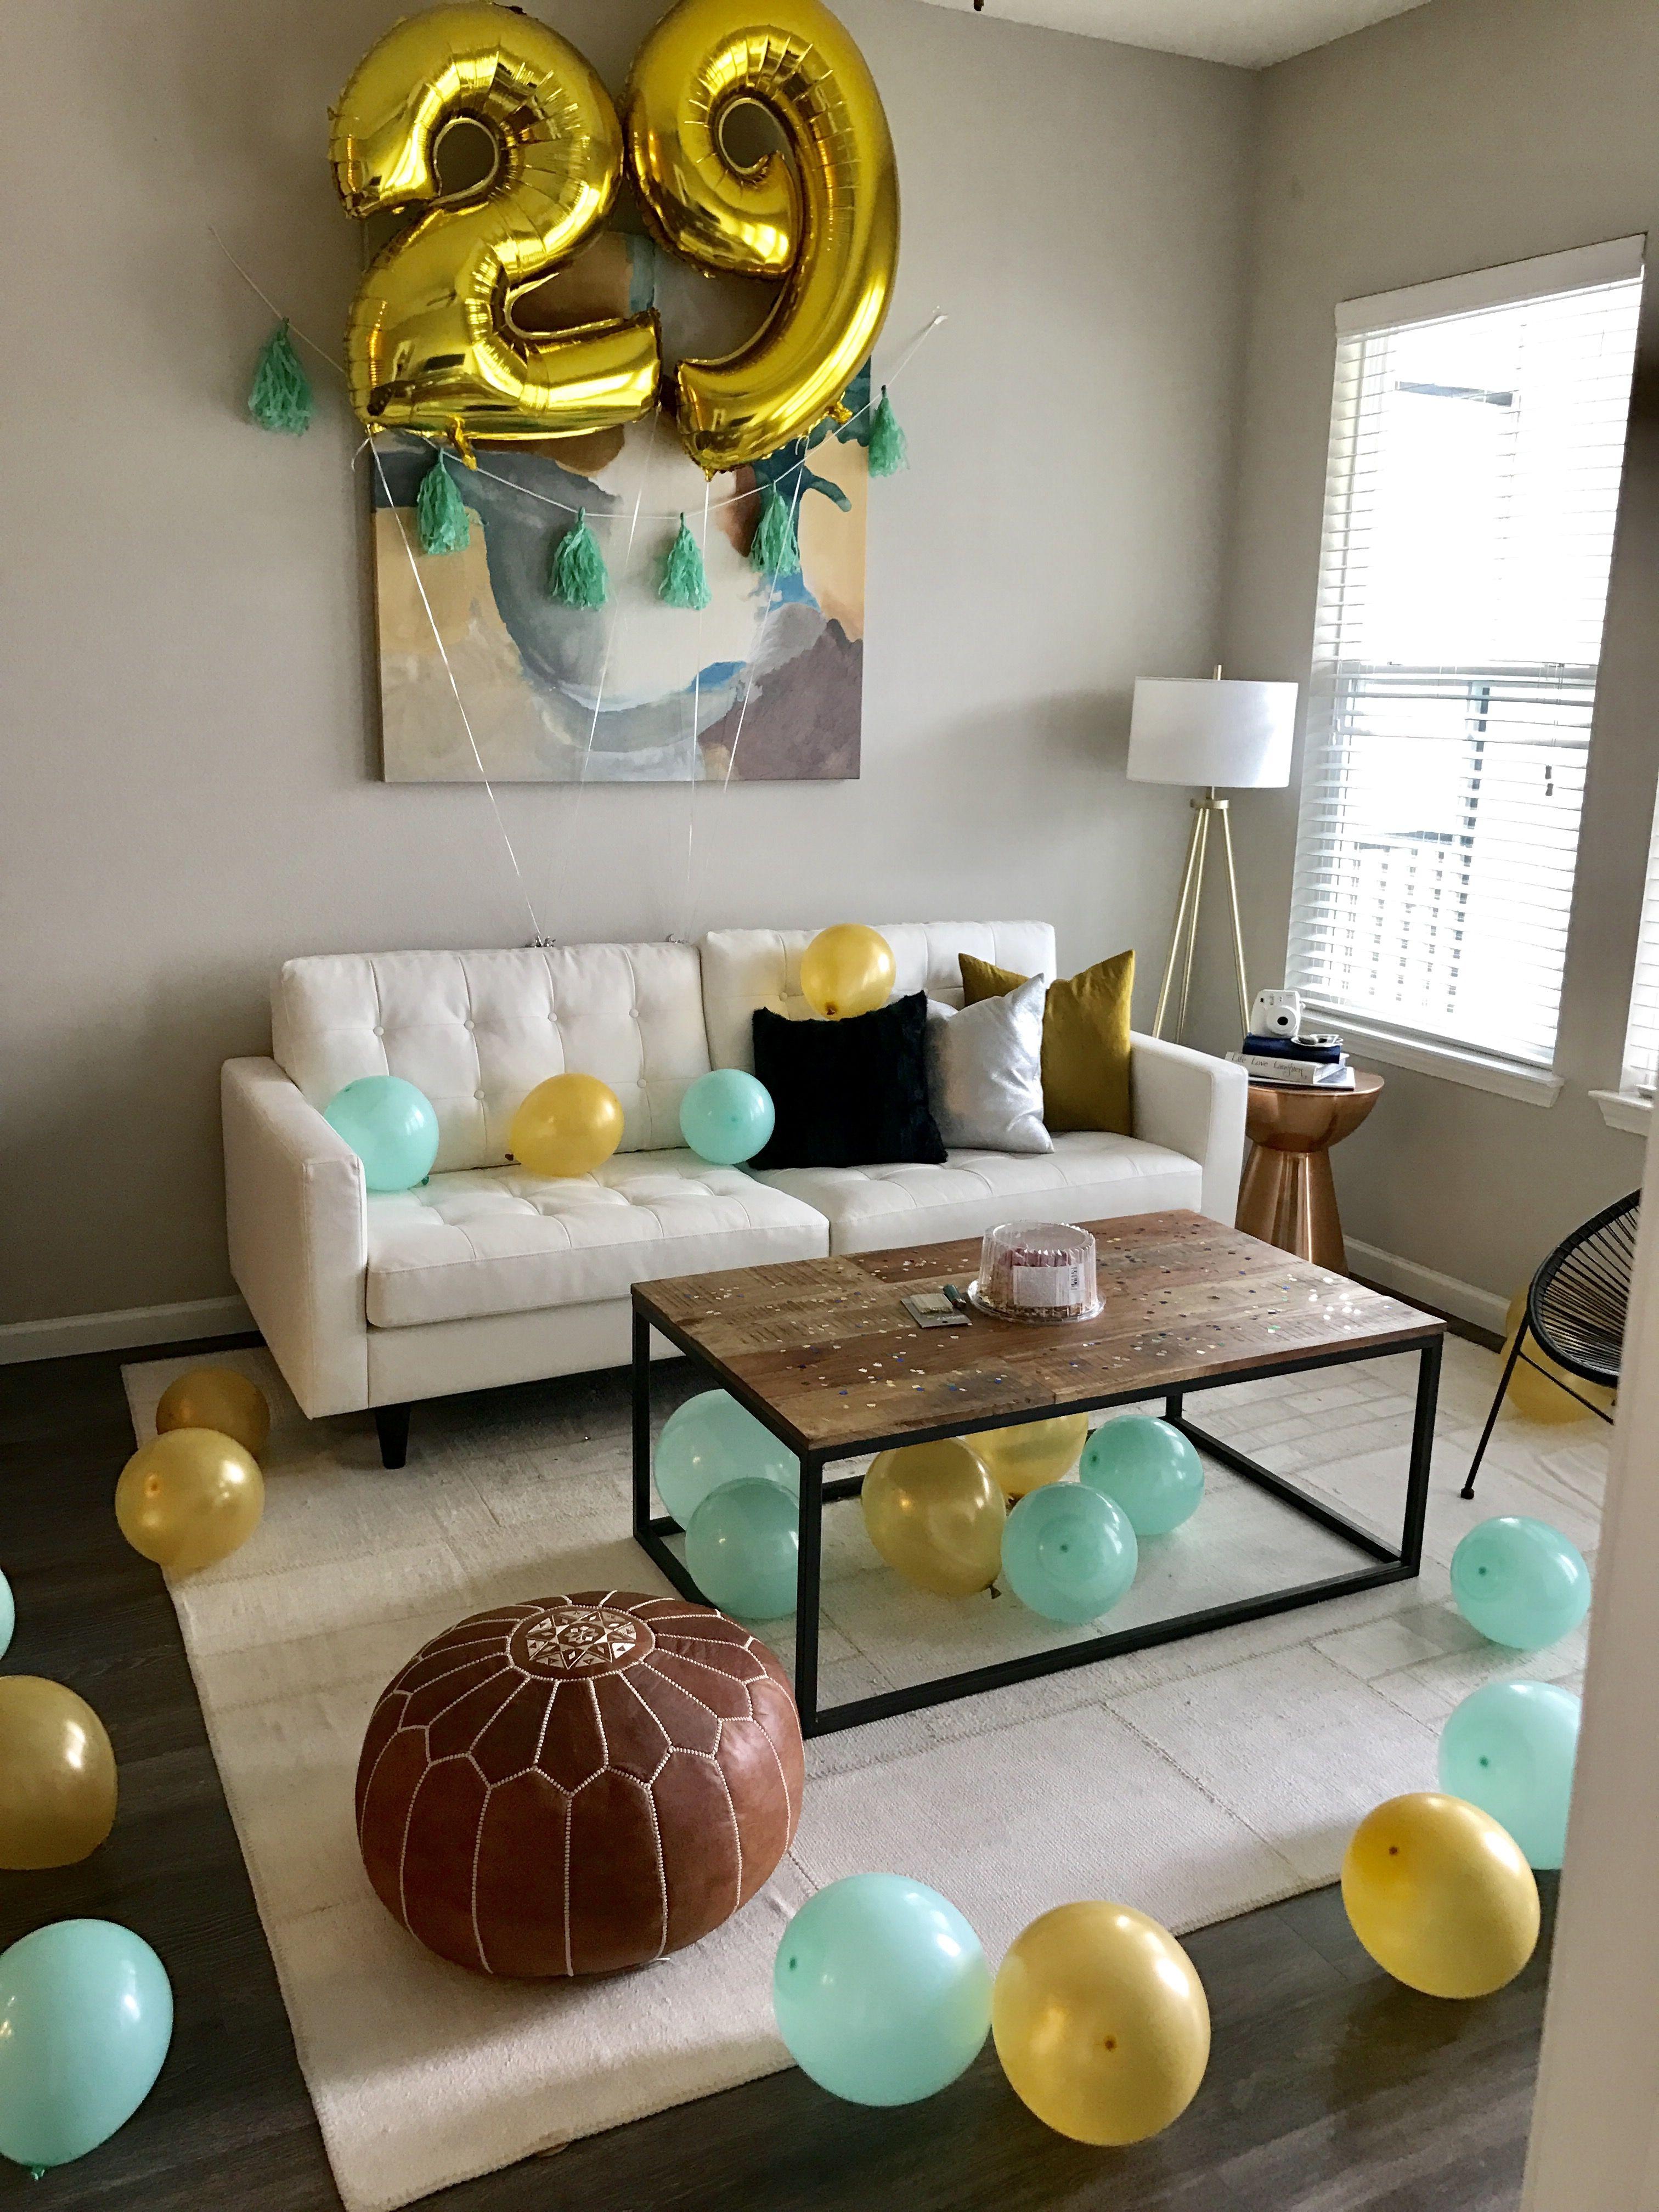 Birthday surprise for him surprise birthday decorations